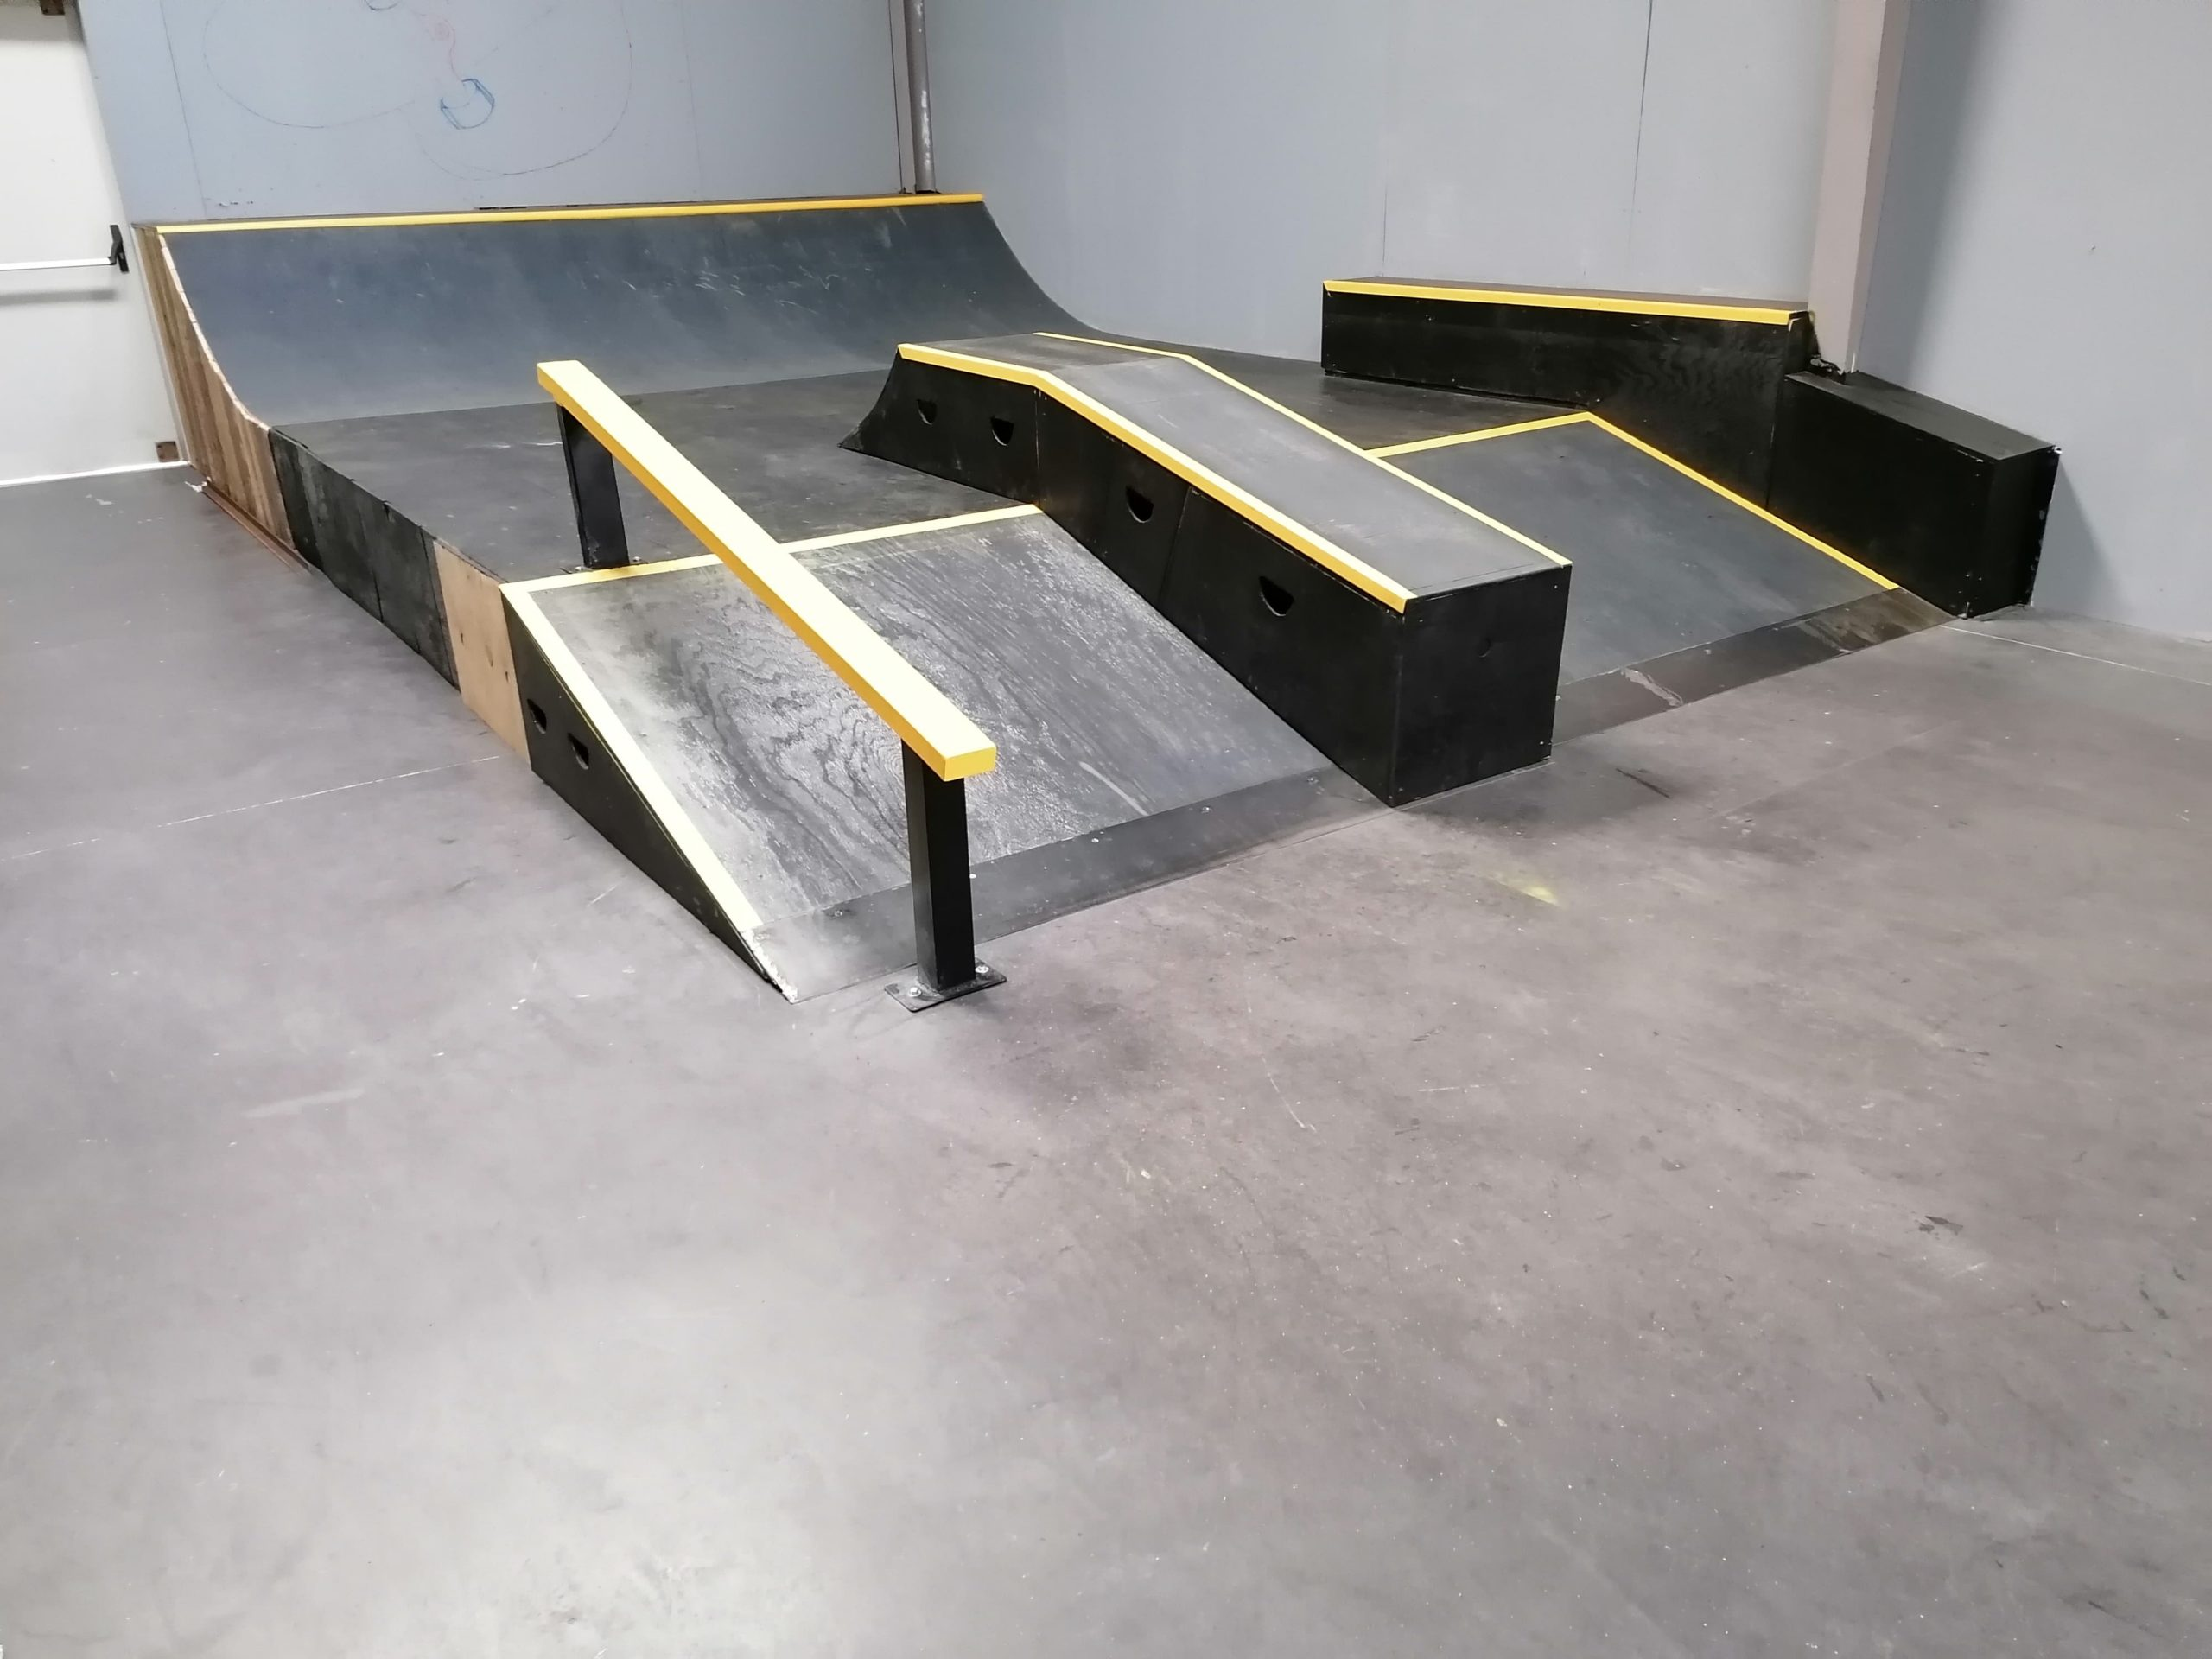 skatepark indoor gironde, nouvelle aquitaine